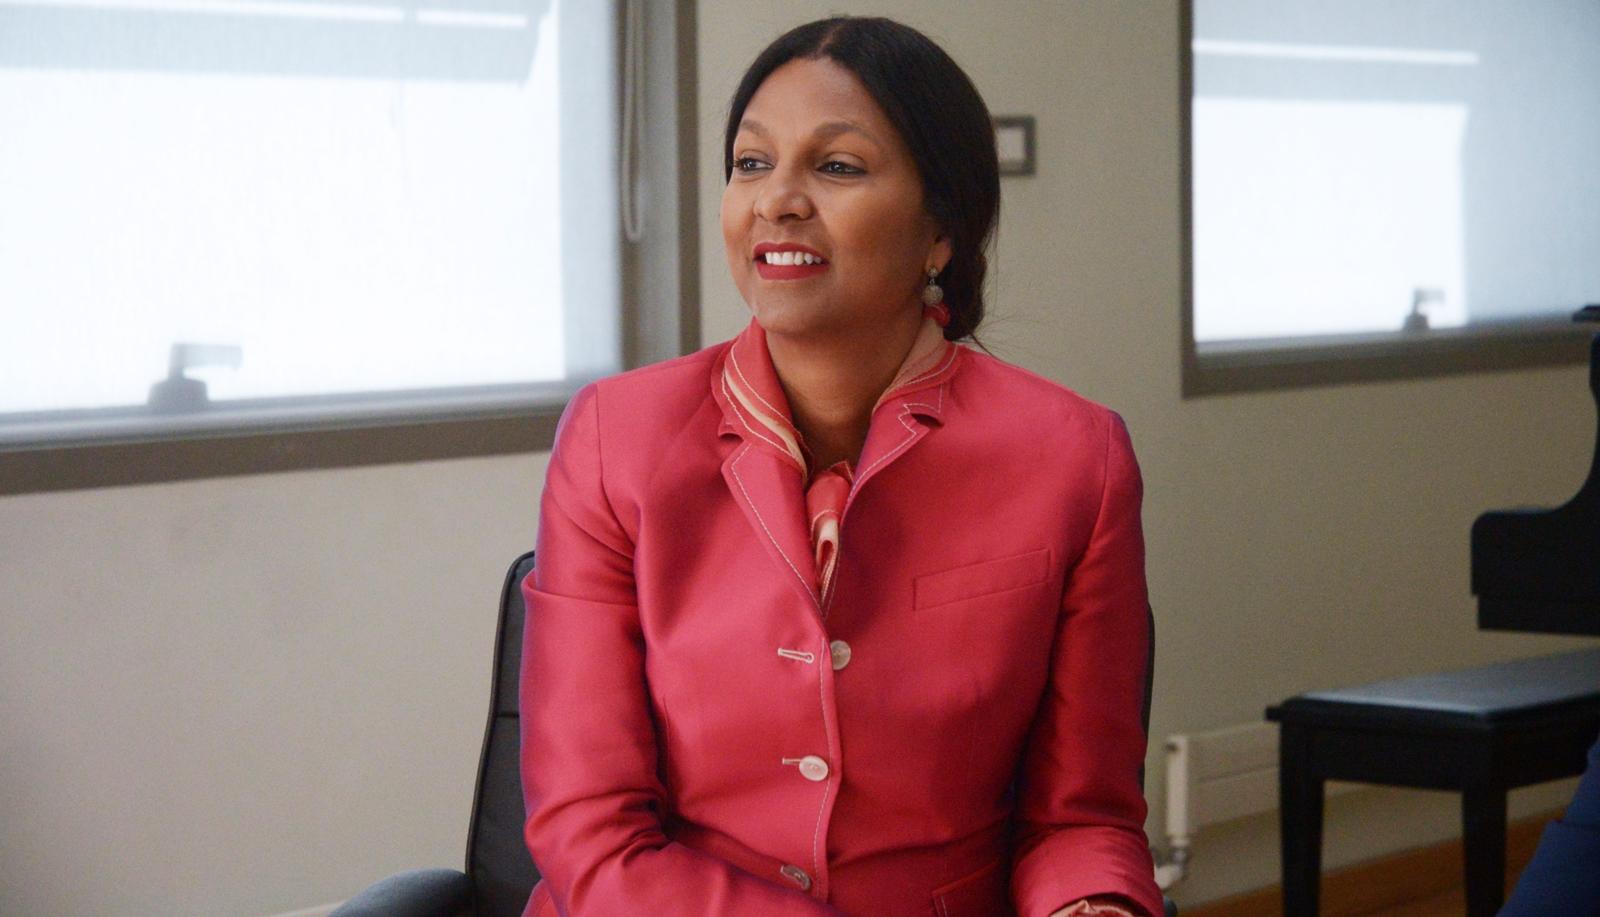 First Lady of Belize Kim Simplis Barrow at AUA